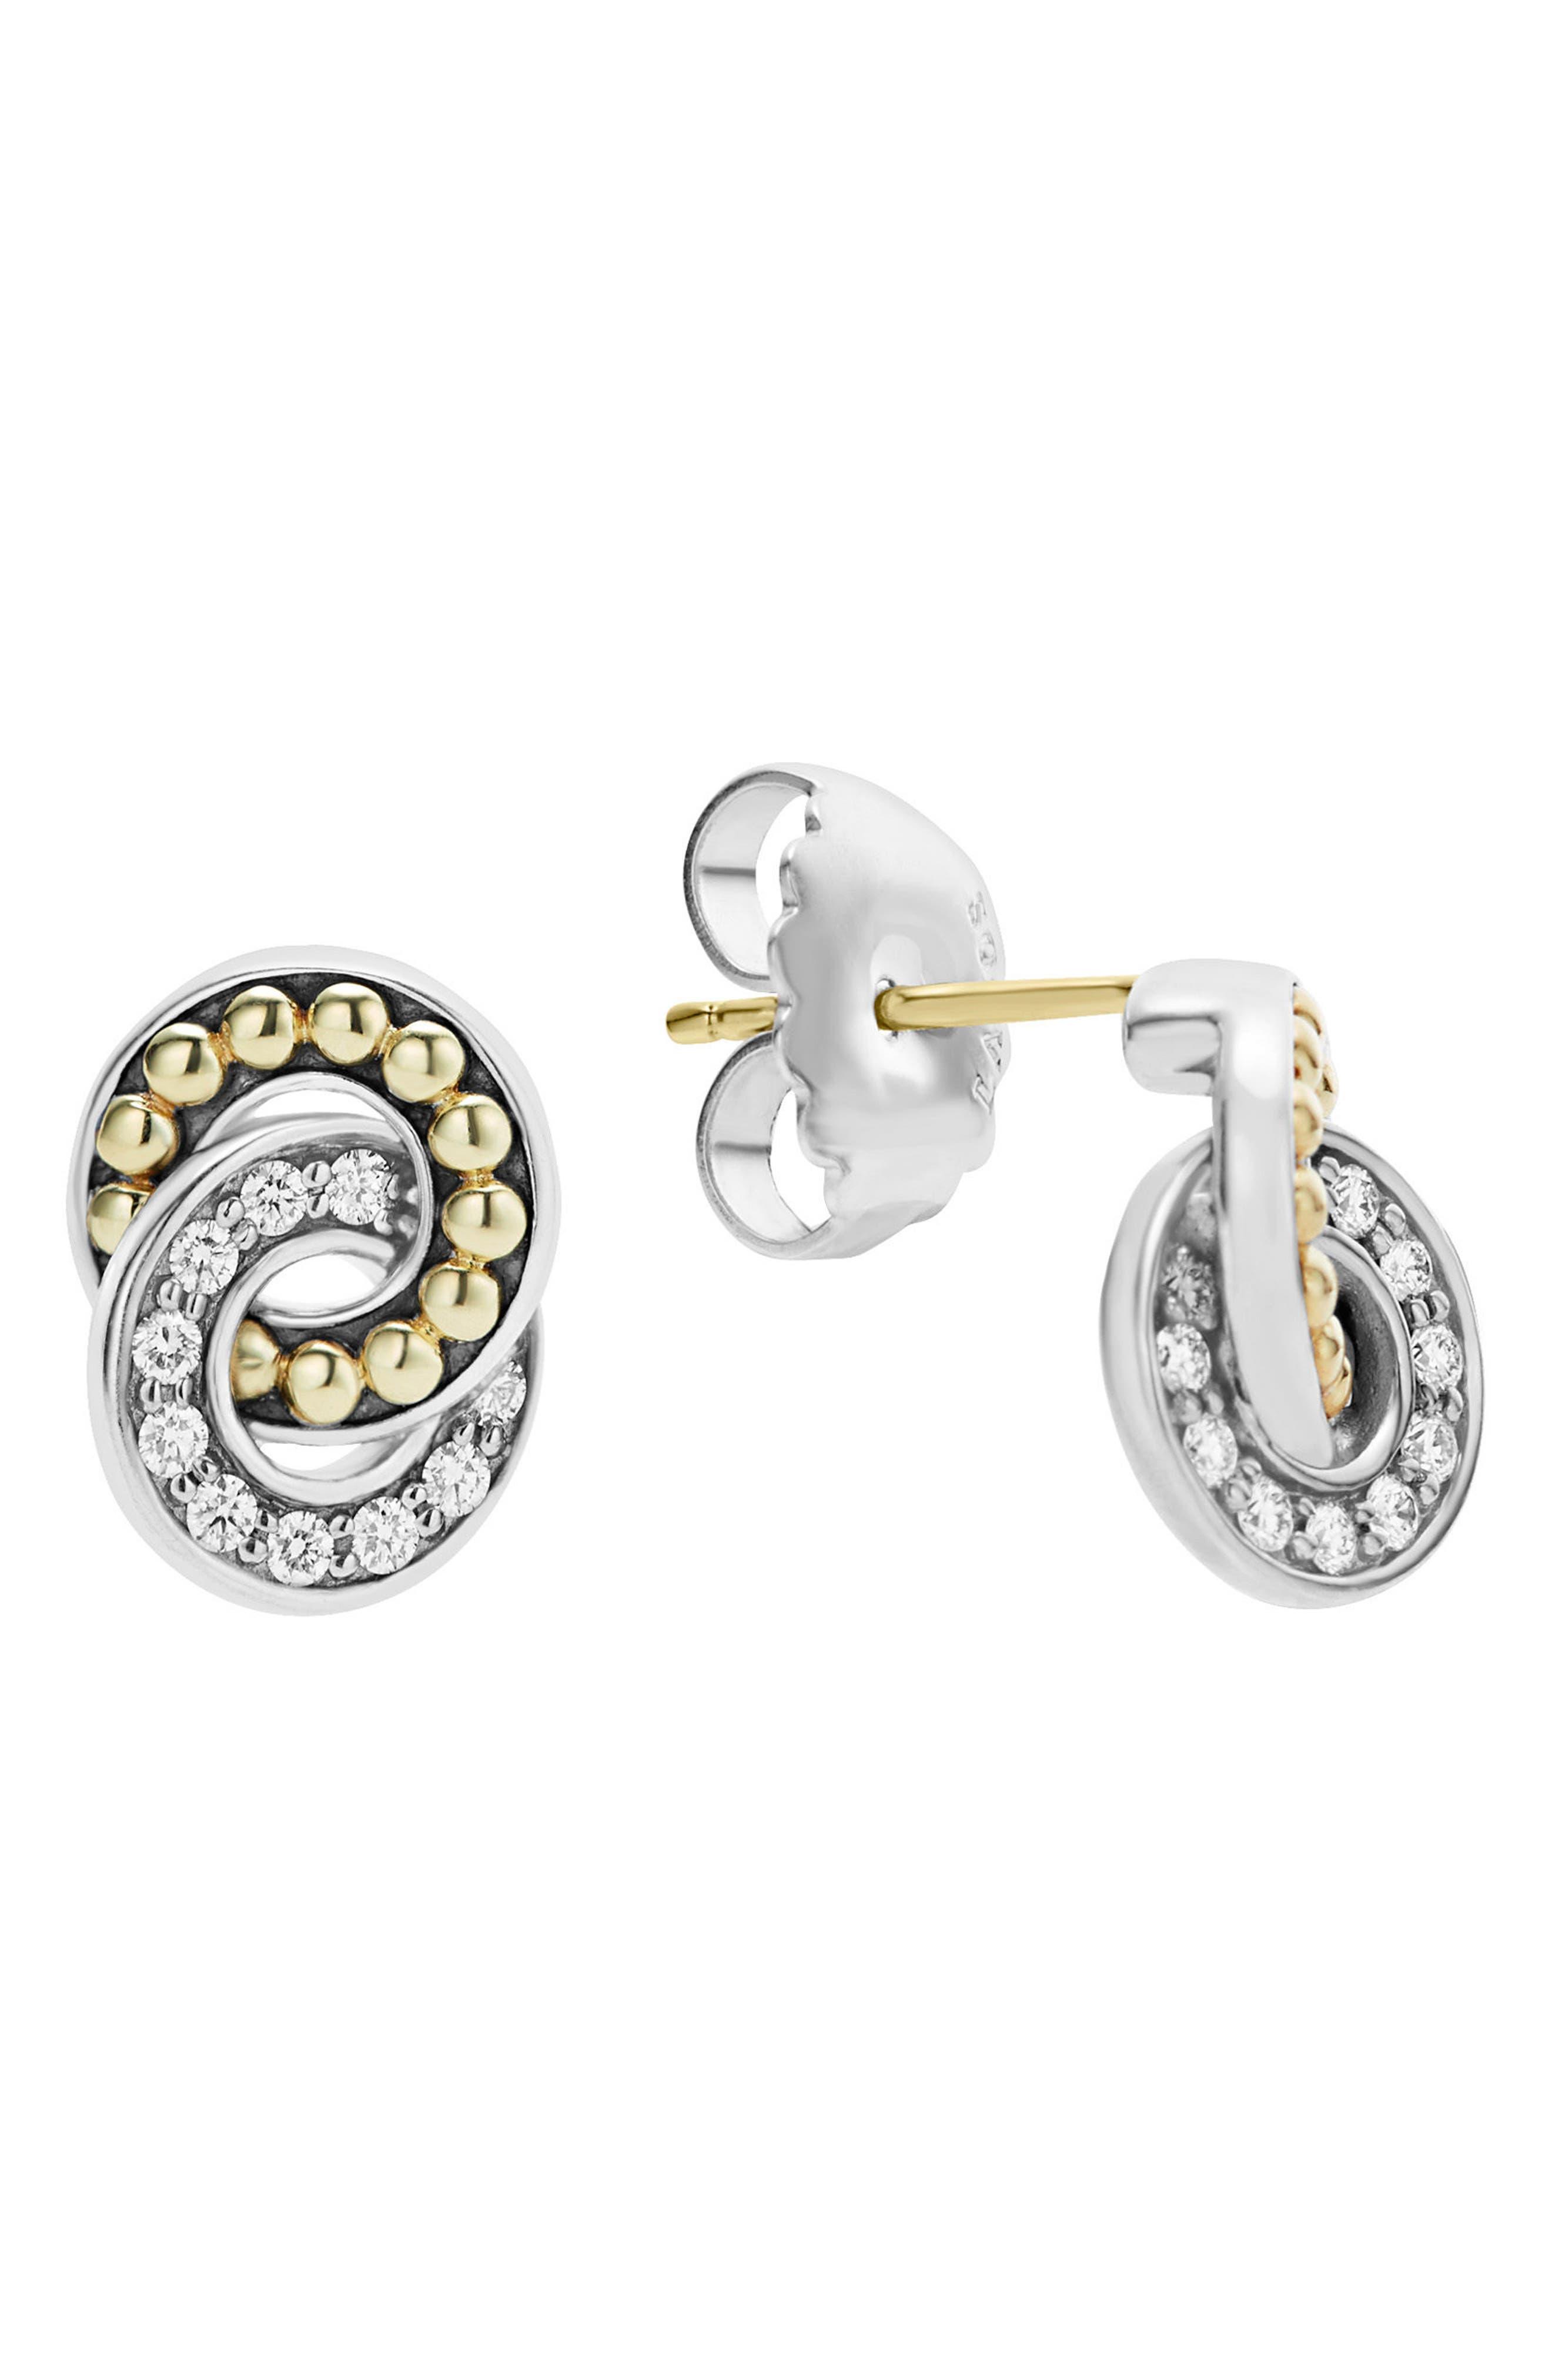 Enso Diamond Stud Earrings,                         Main,                         color, SILVER